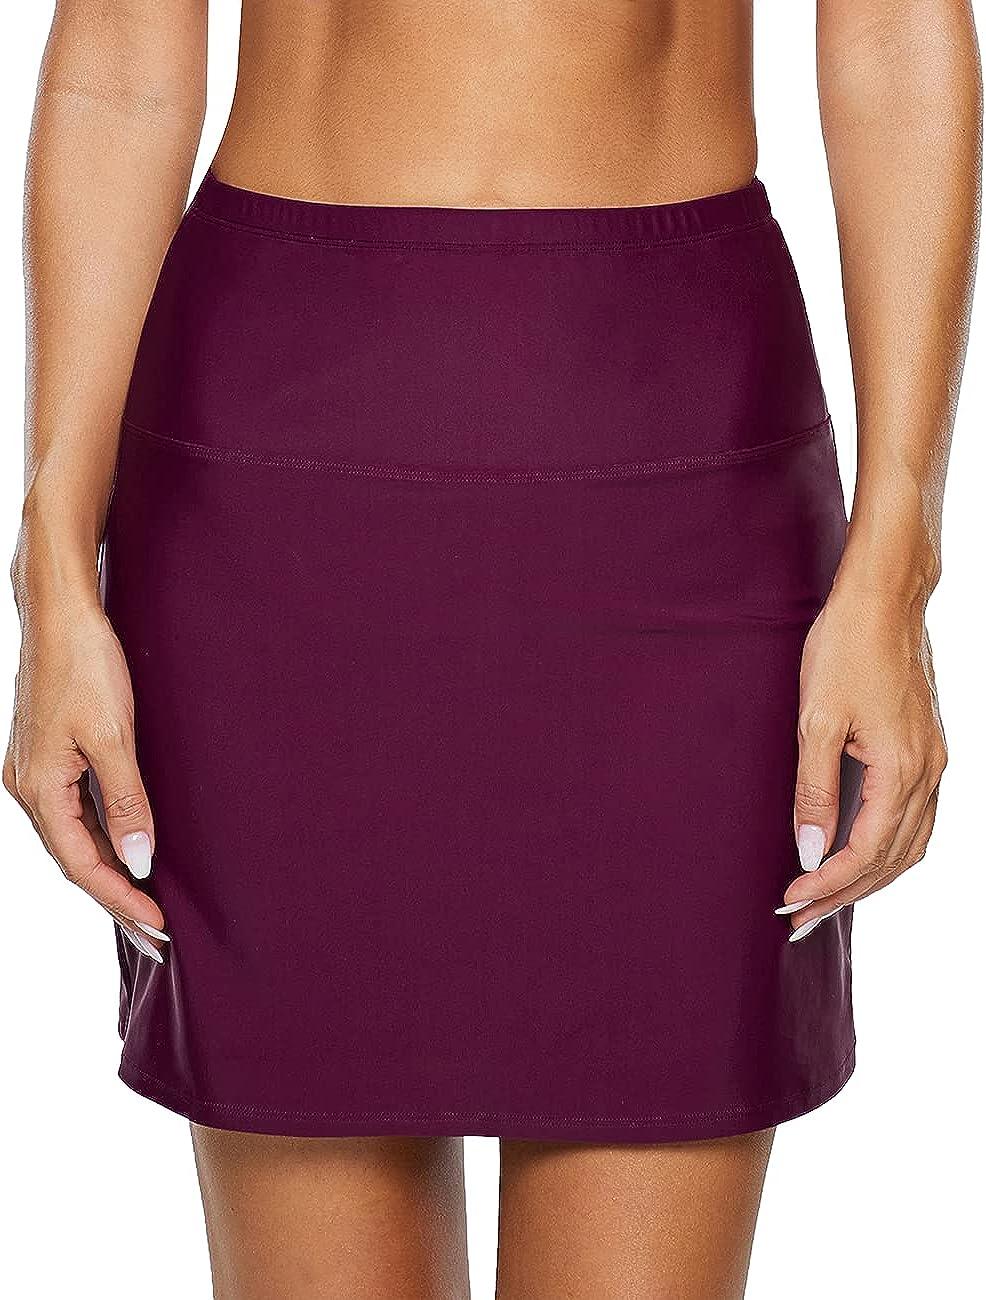 coastal rose Women's Swim Skirt High Waist Bikini Bottom Tankini